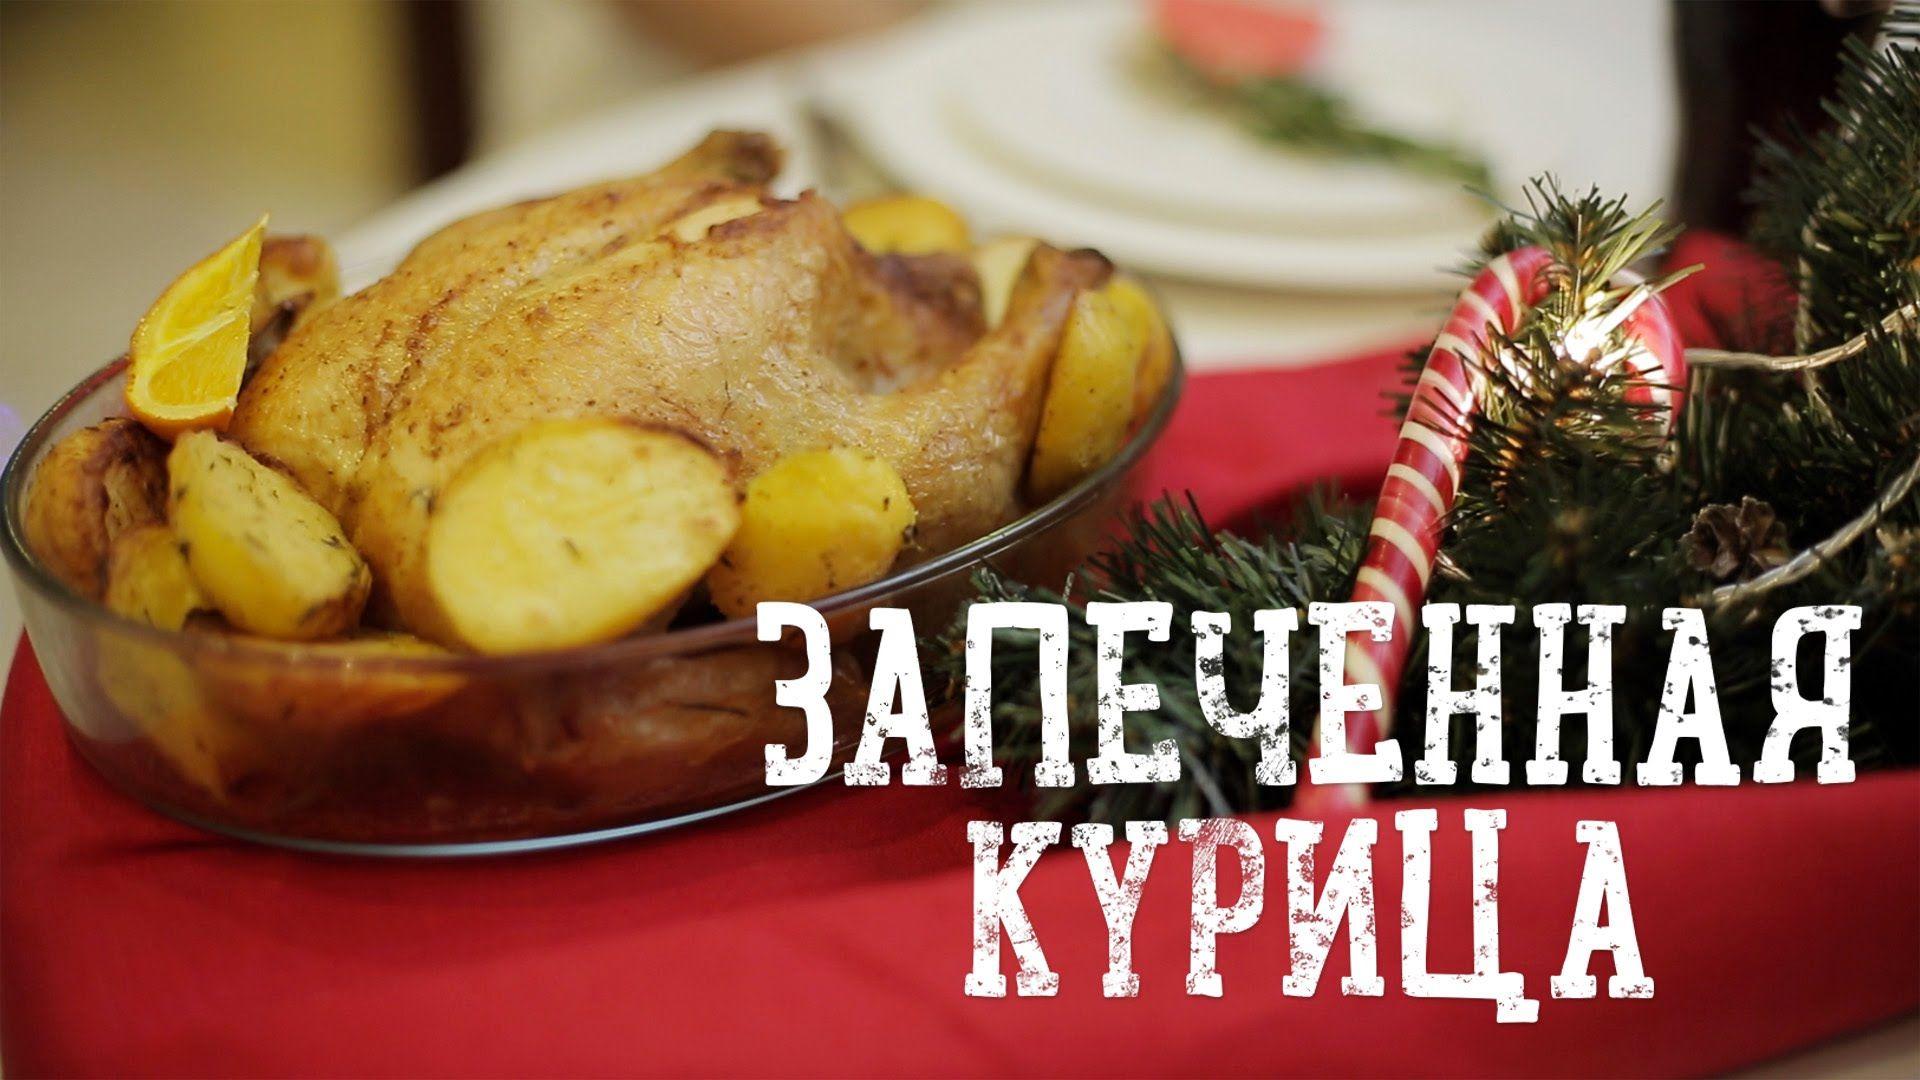 Запеченная курица с лимоном и розмарином [Рецепты Bon Appetit] #tasty #food #yammy #chicken #food #eat #home